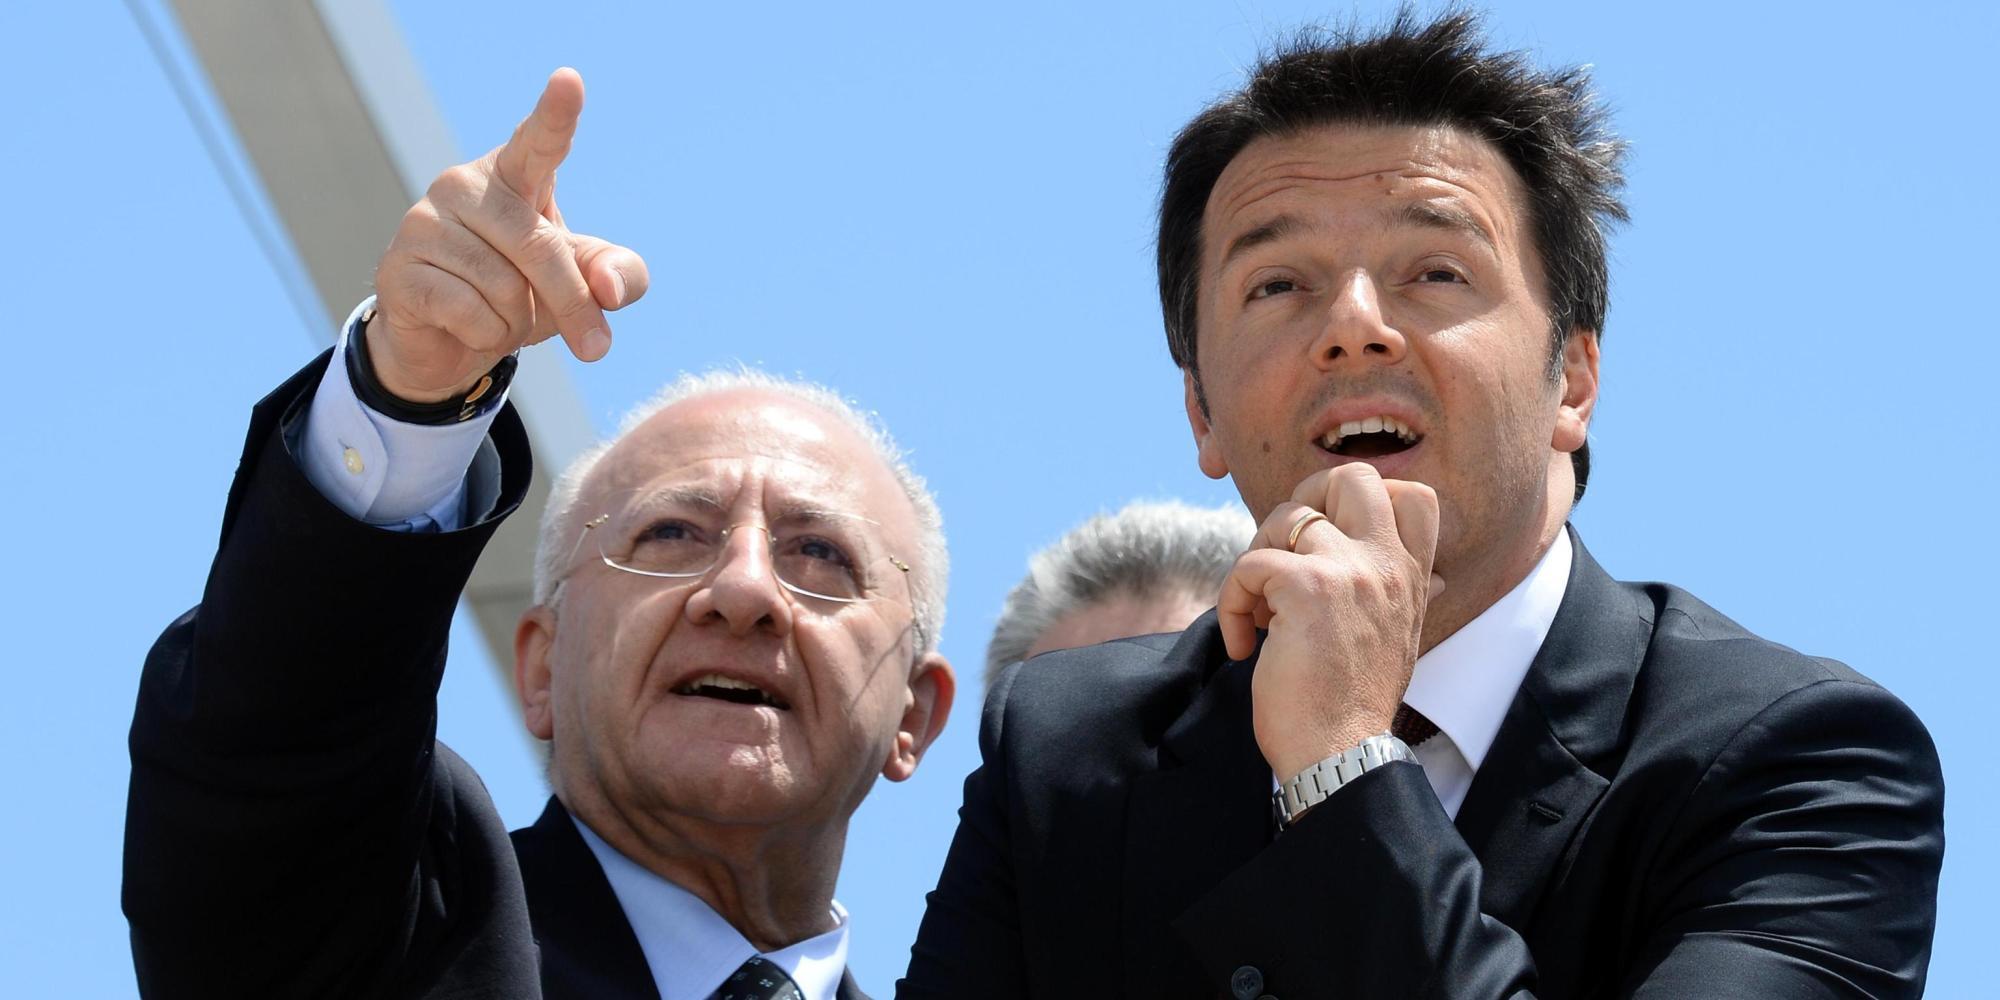 Regionali 2015, Renzi a Salerno sale sul carro di De Luca e si scorda ...: www.huffingtonpost.it/2015/05/22/regionali-de-luca-renzi_n_7422212...